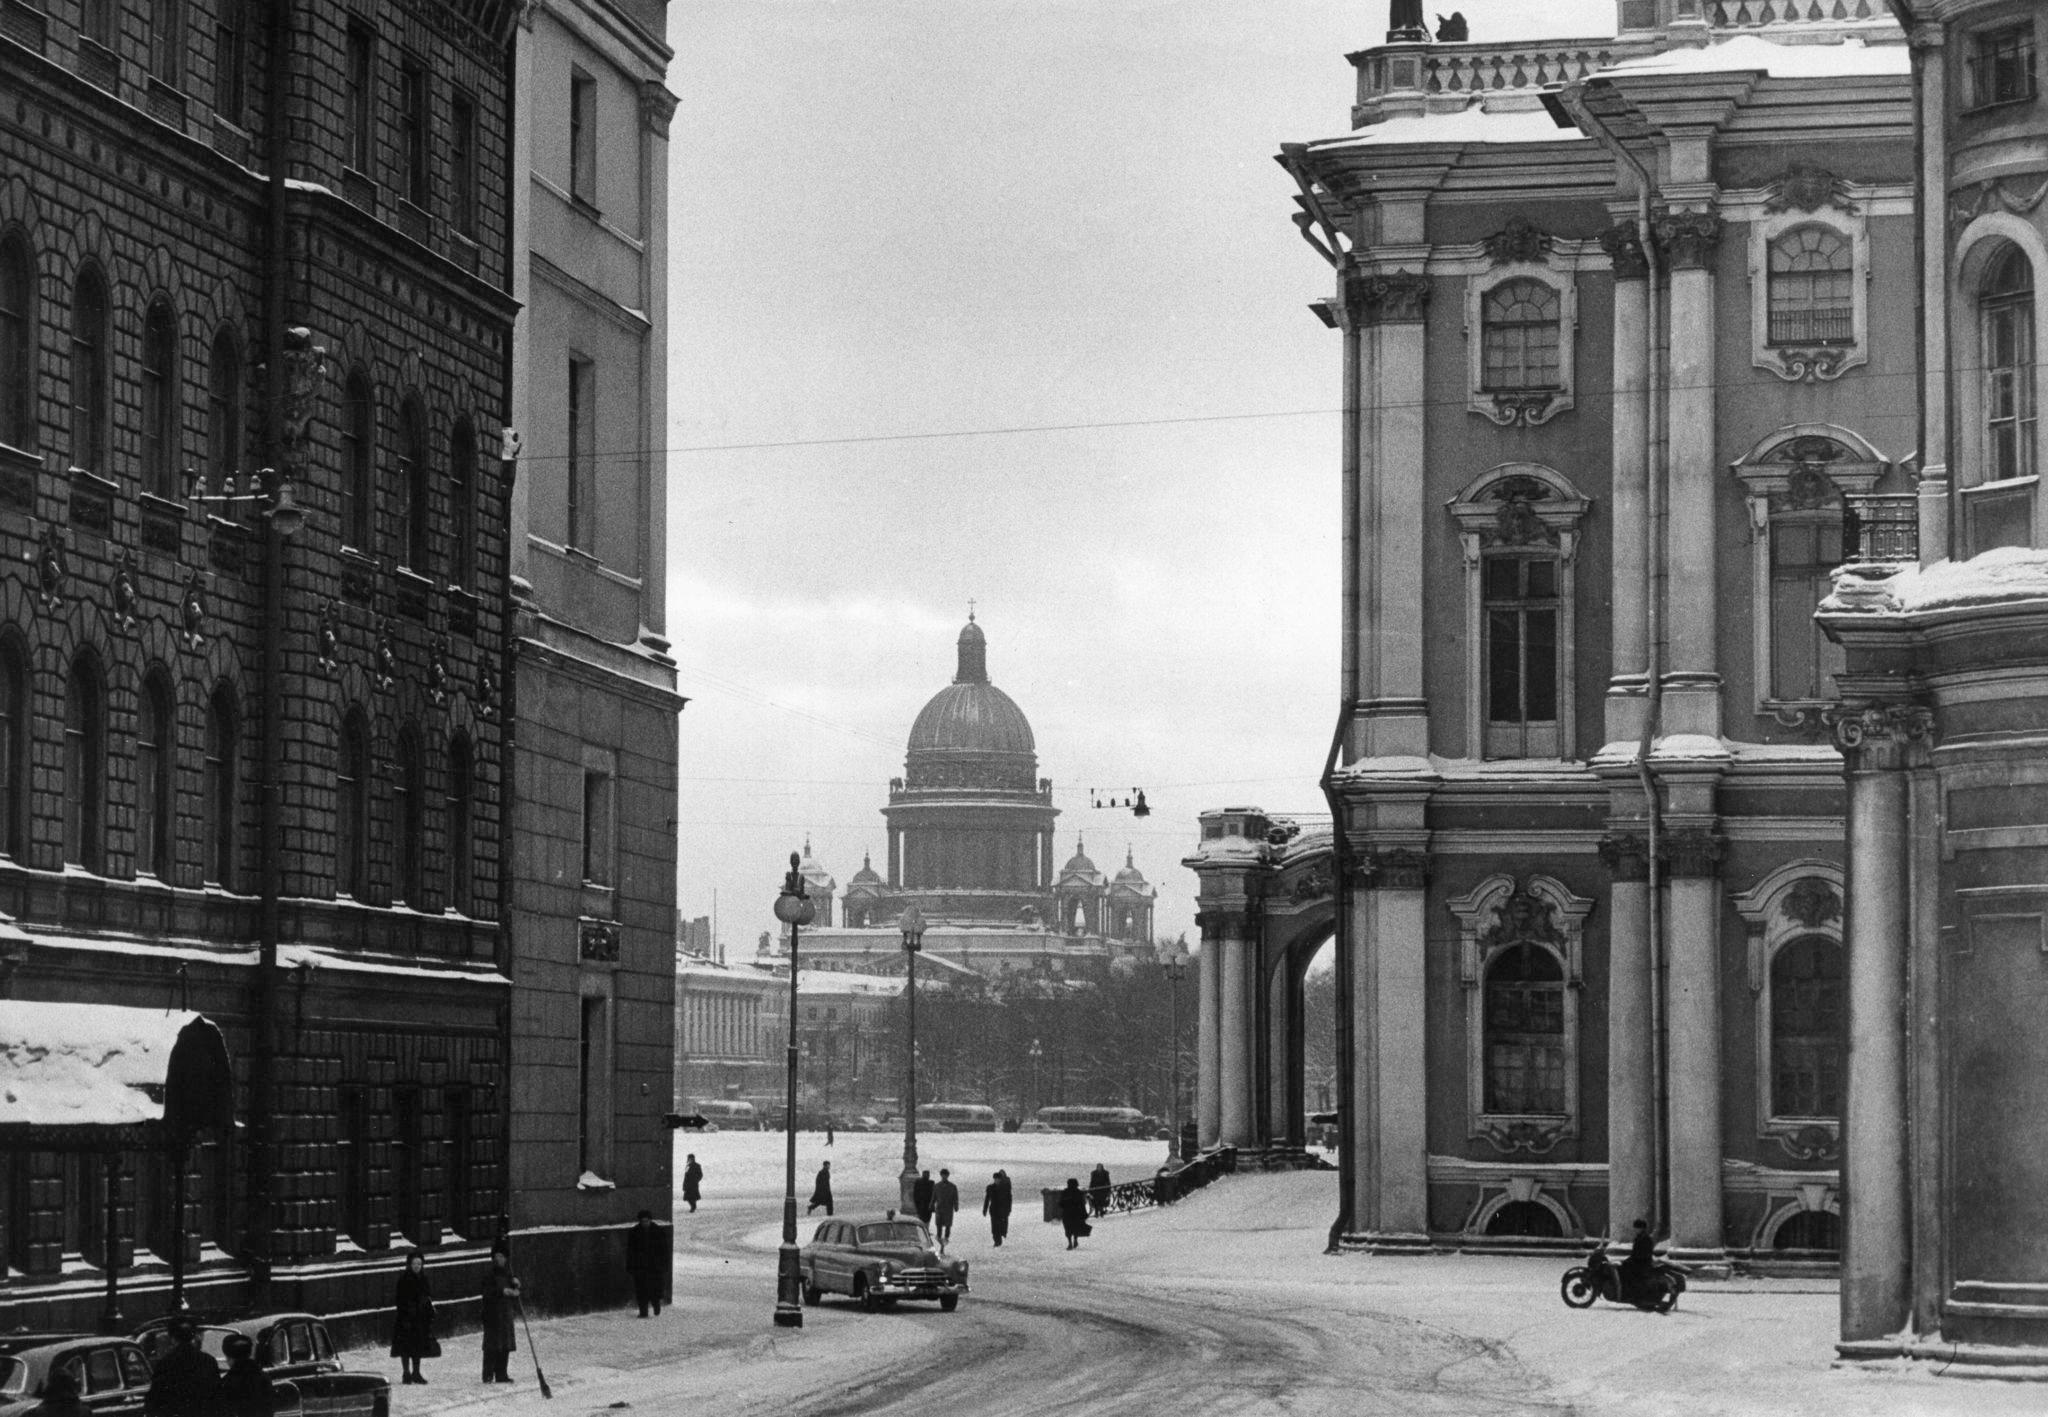 Вид на Дворцовую площадь от Нового Эрмитажа